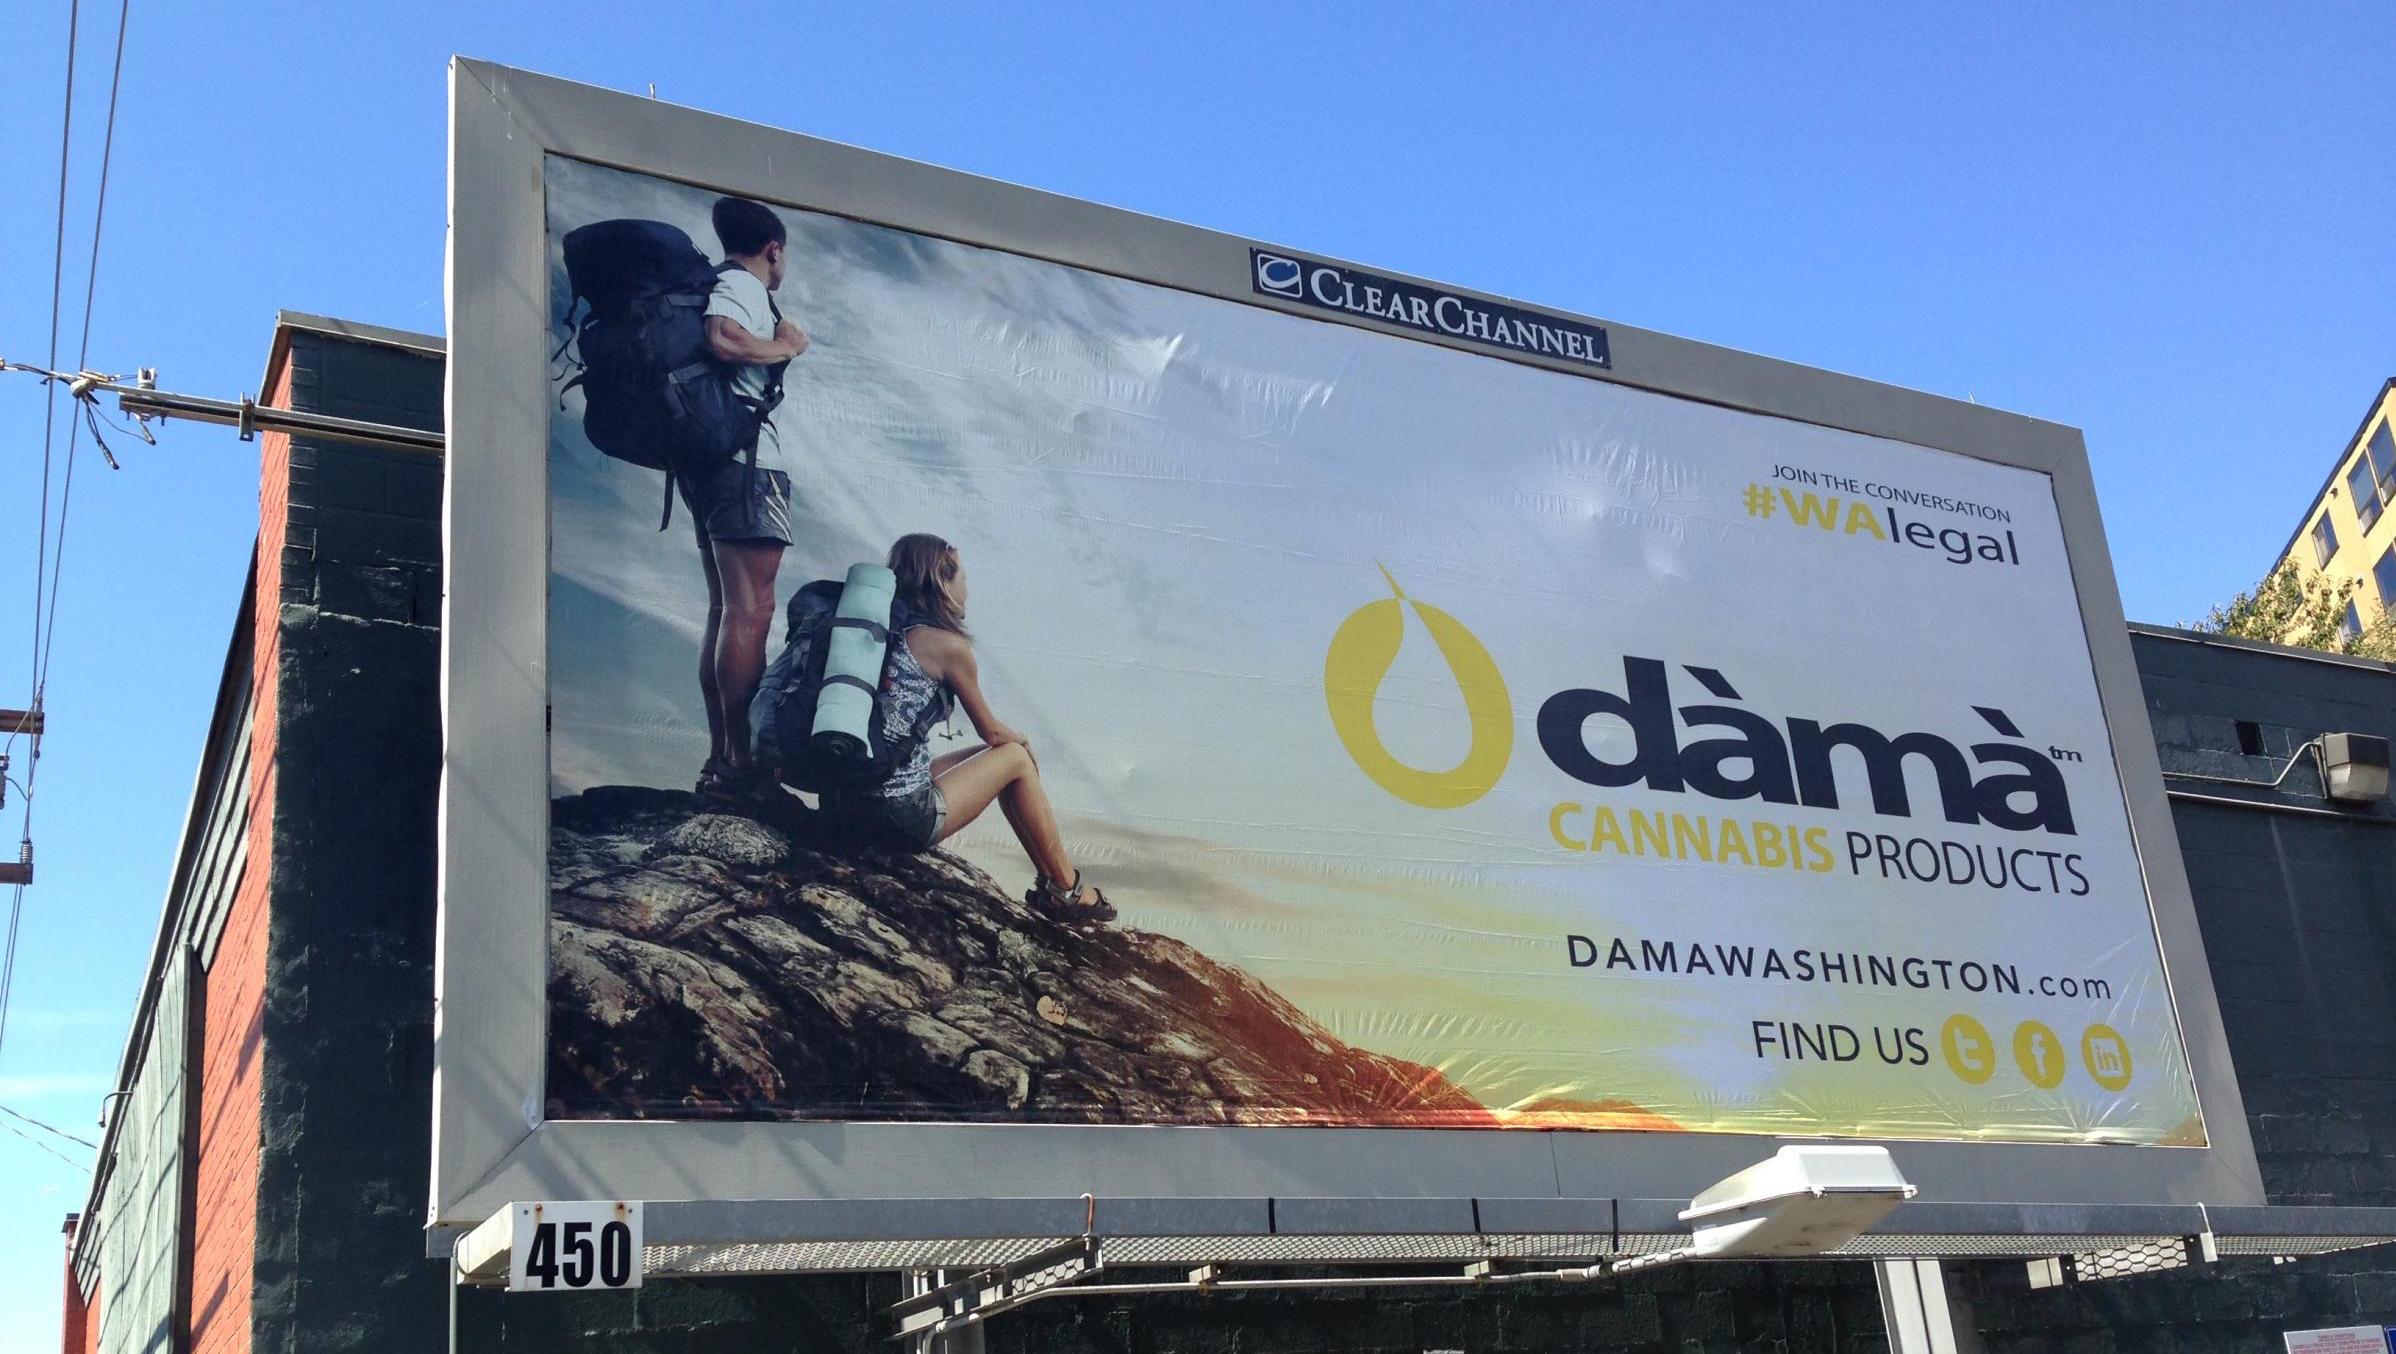 damacannabisbillboard